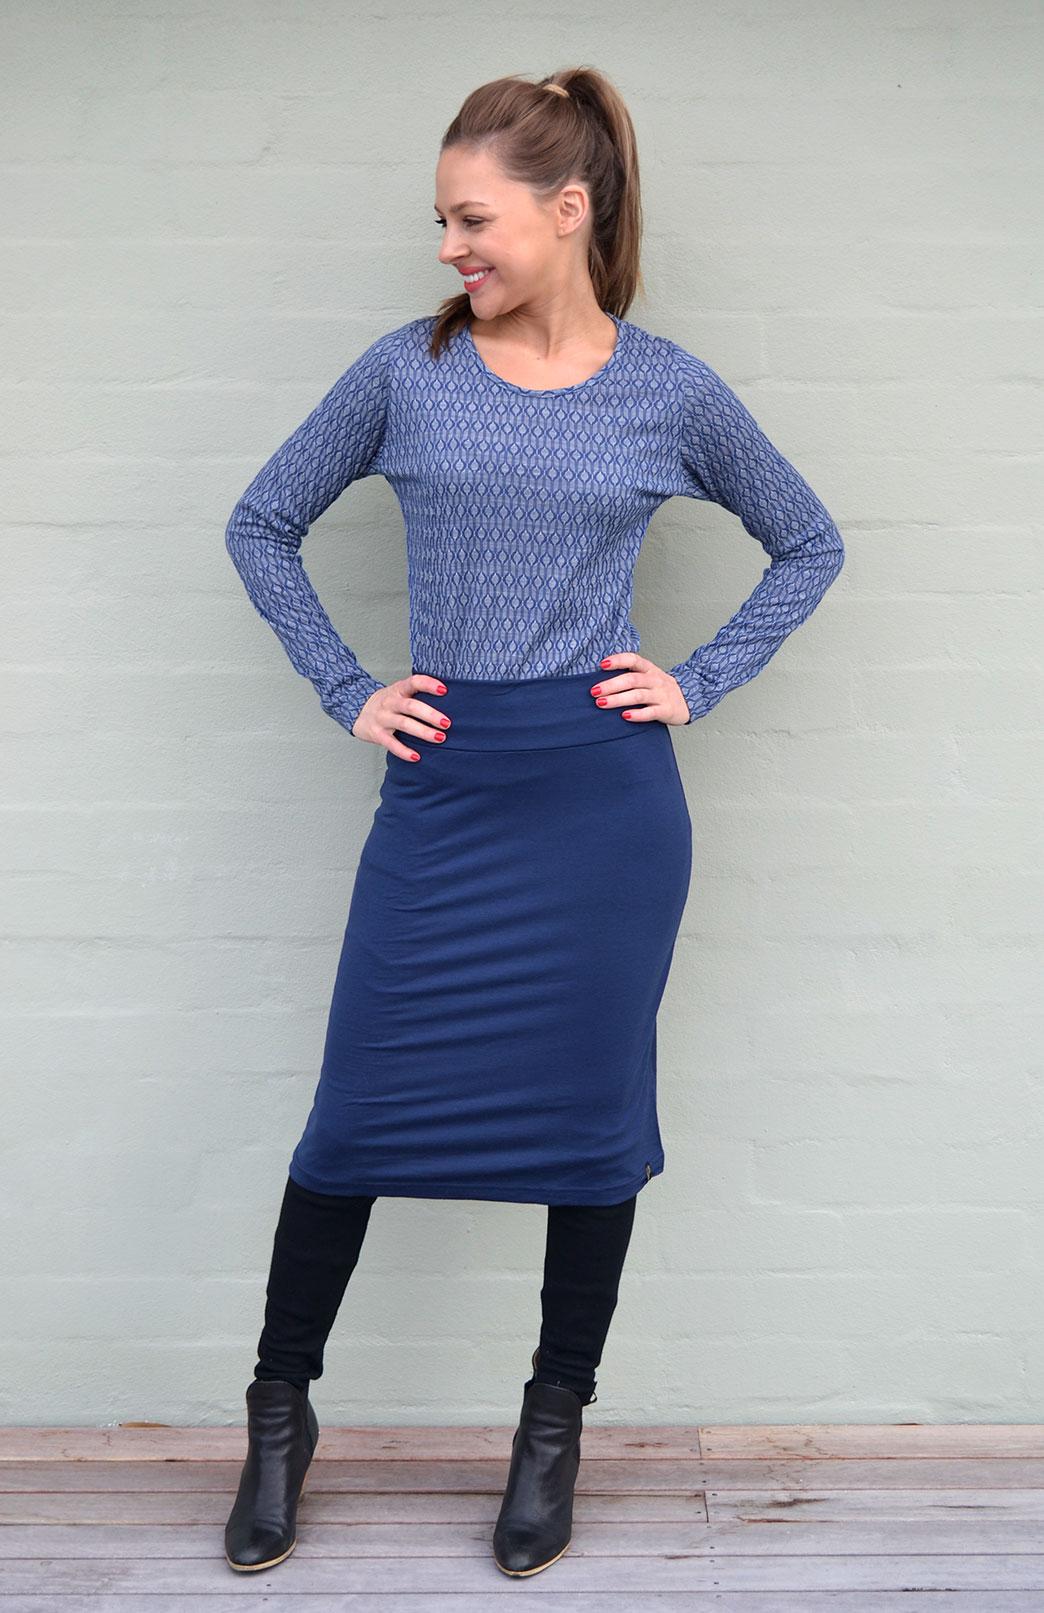 Round Neck Top - Patterned - Women's Blue Keyhole Patterned Long Sleeve Merino Wool Thermal Fashion Top - Smitten Merino Tasmania Australia